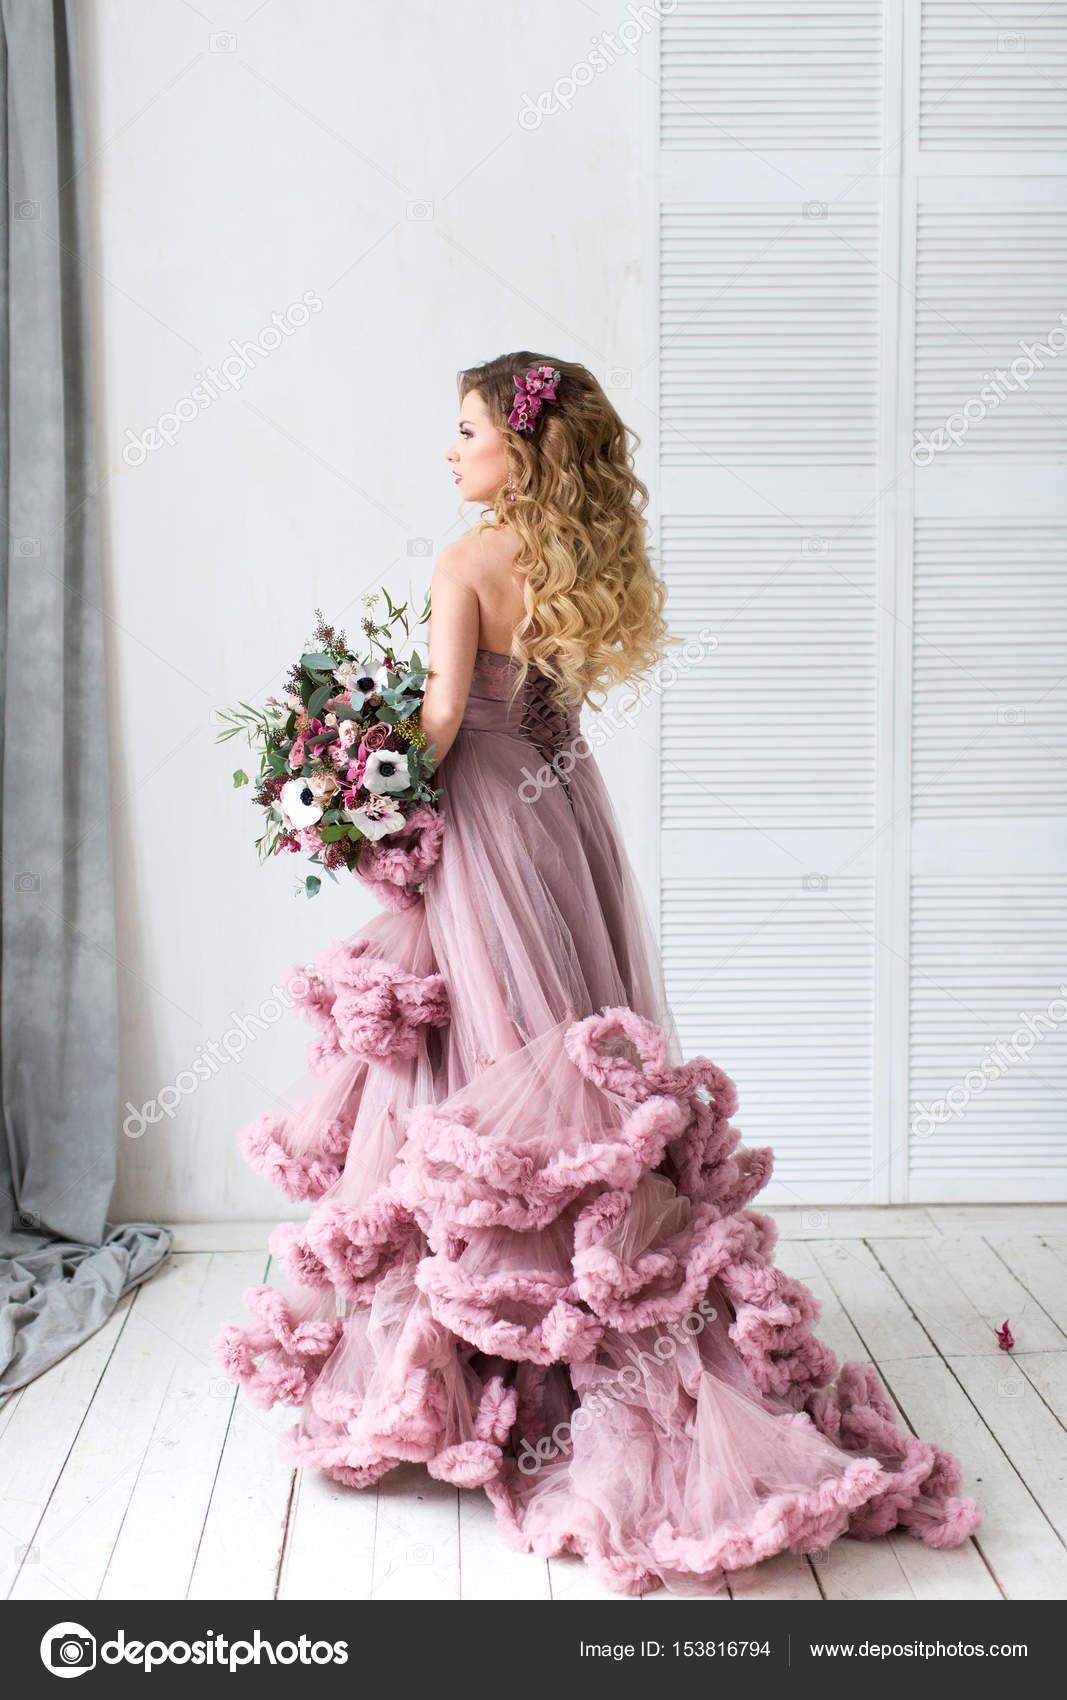 3ba7798b6210 Ρομαντικό μόδας γυναίκα σε ένα ροζ φόρεμα και ανθοδέσμη — Φωτογραφία Αρχείου